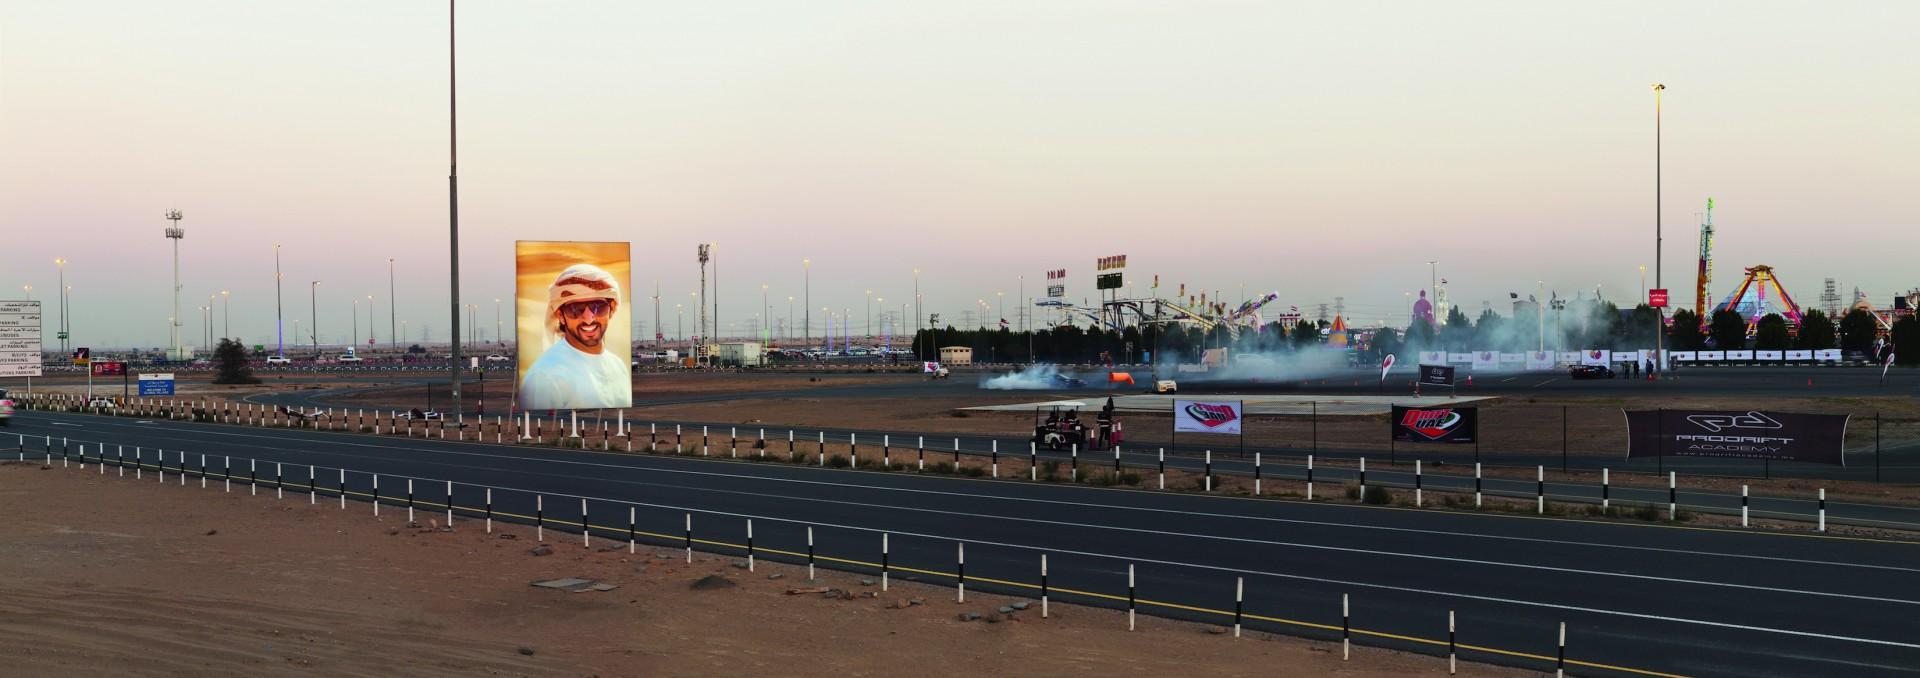 "Der Vergnügungspark. 25°04'22""N, 55°18'13""E, 2013, Dubailand Global Village"